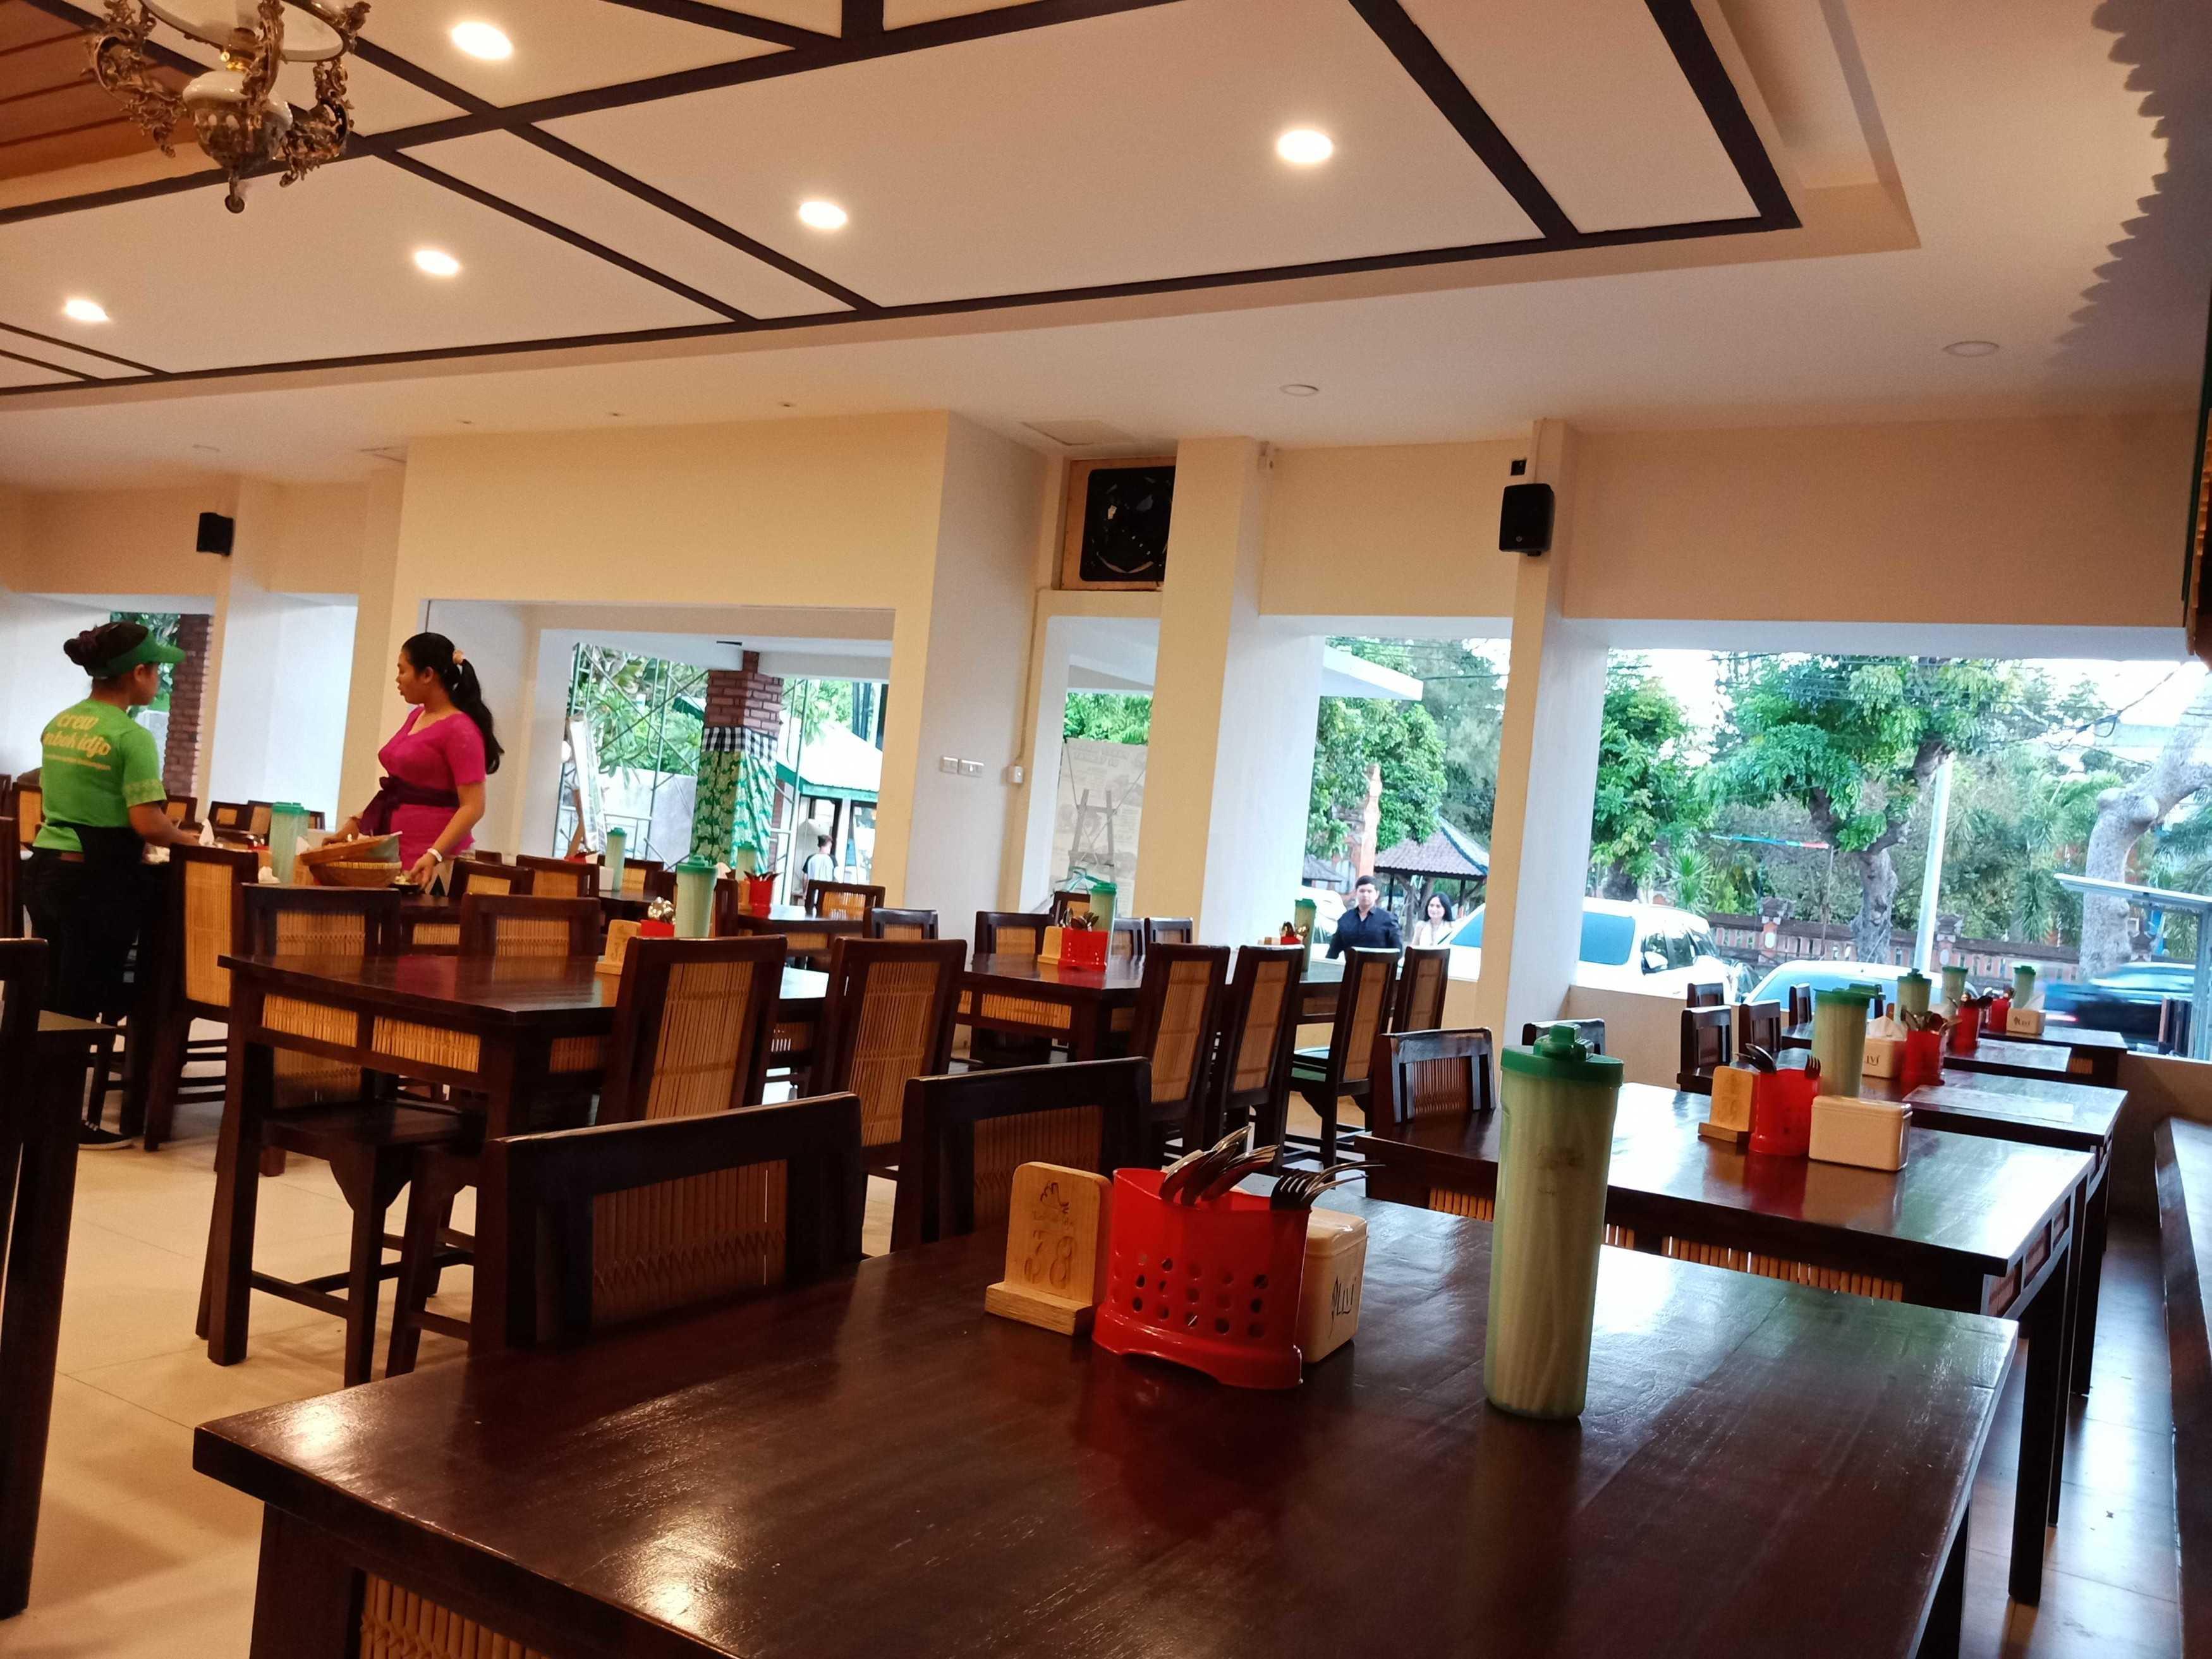 Roku+Architects Restaurant Lombok Idjo Renon Renon, Kec. Denpasar Sel., Kota Denpasar, Bali, Indonesia Renon, Kec. Denpasar Sel., Kota Denpasar, Bali, Indonesia Rokuarchitects-Restaurant-Lombok-Idjo-Renon   115897